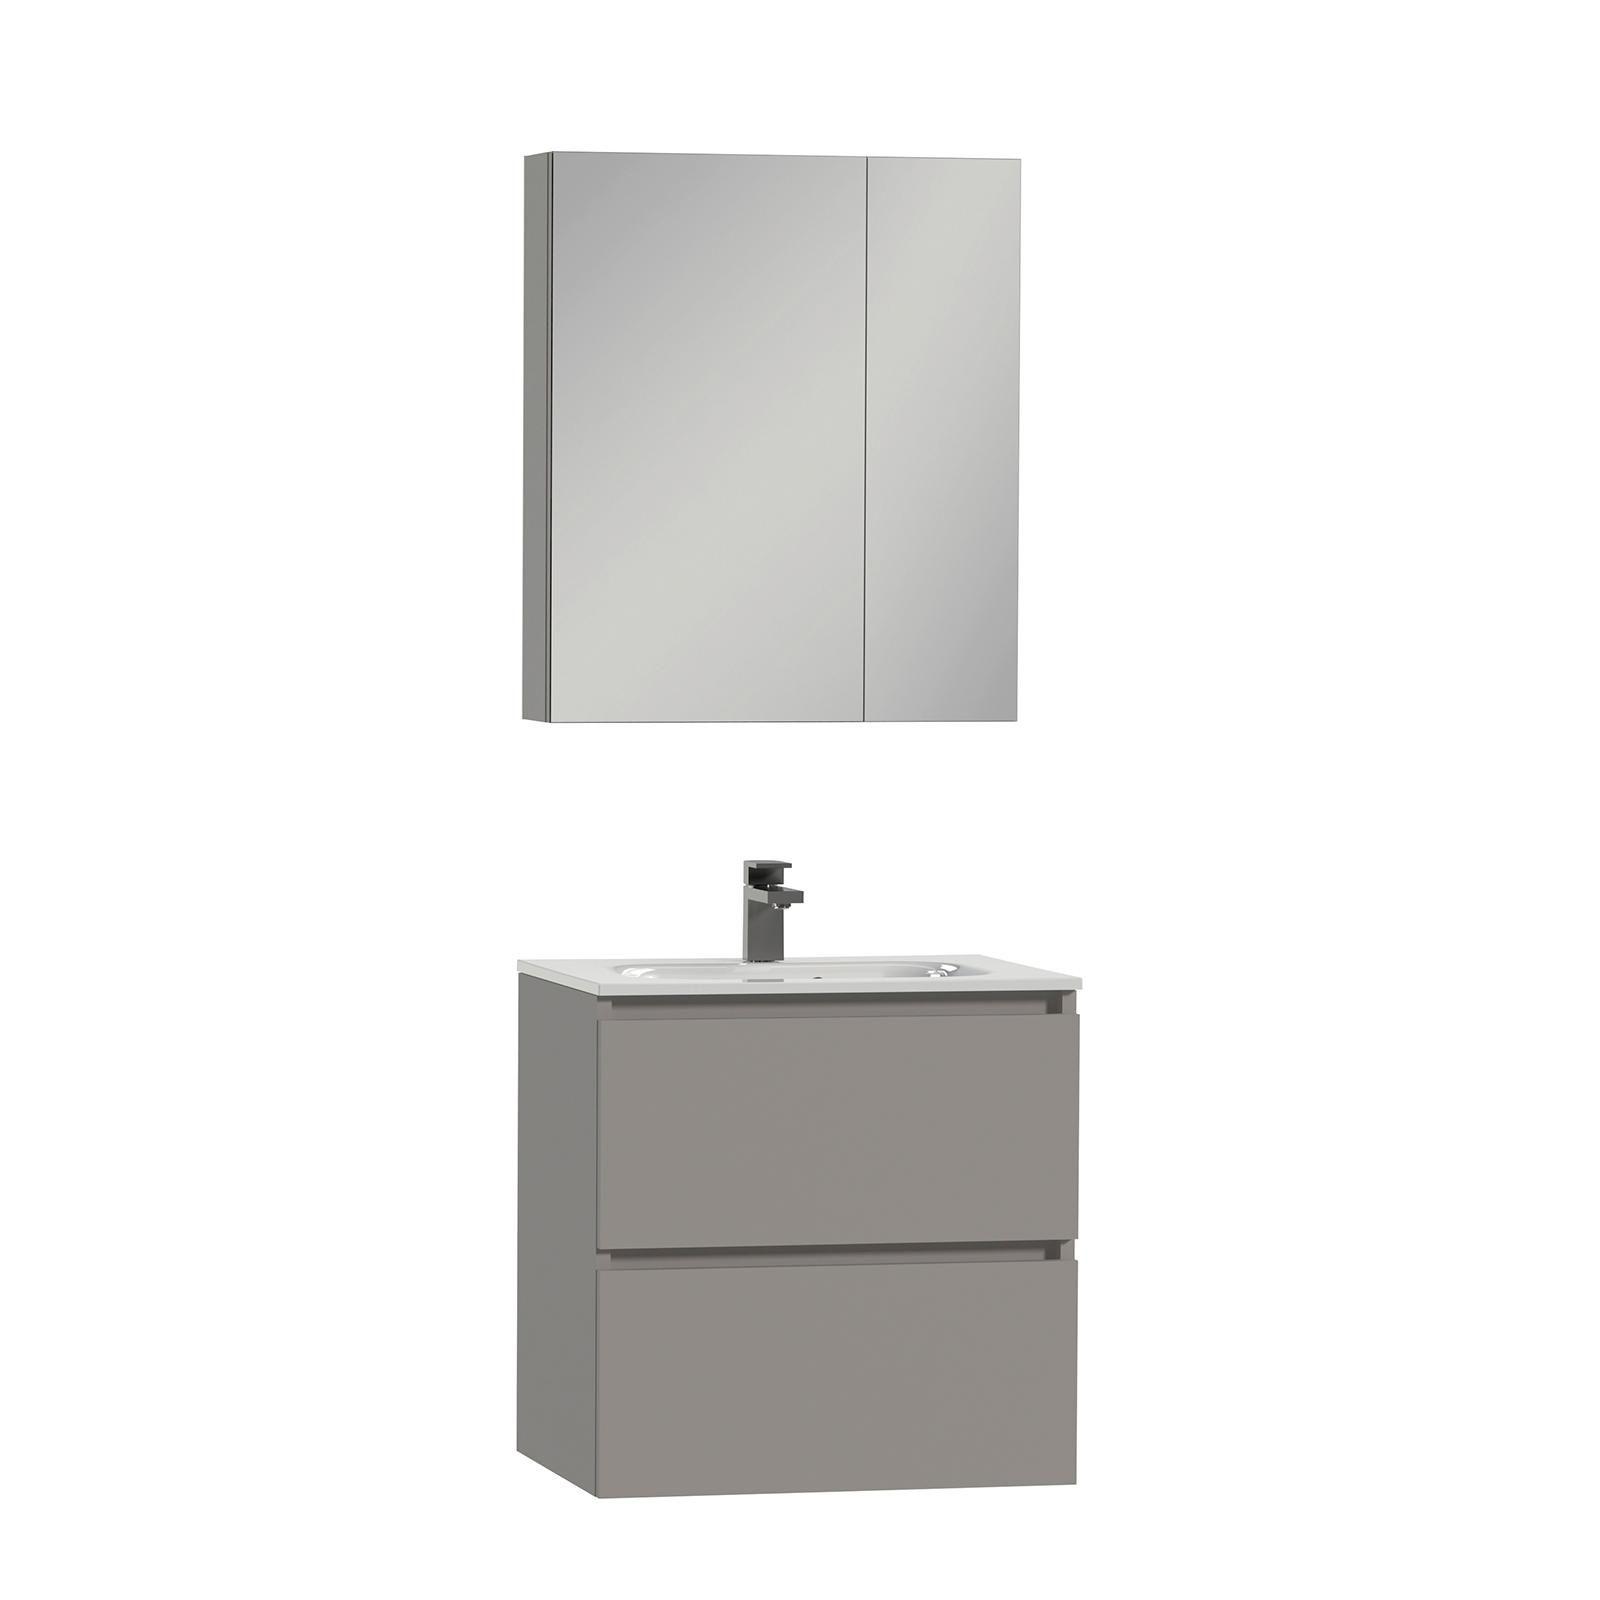 Loft Badkamermeubel 60cm met spiegelkast en witte wastafel